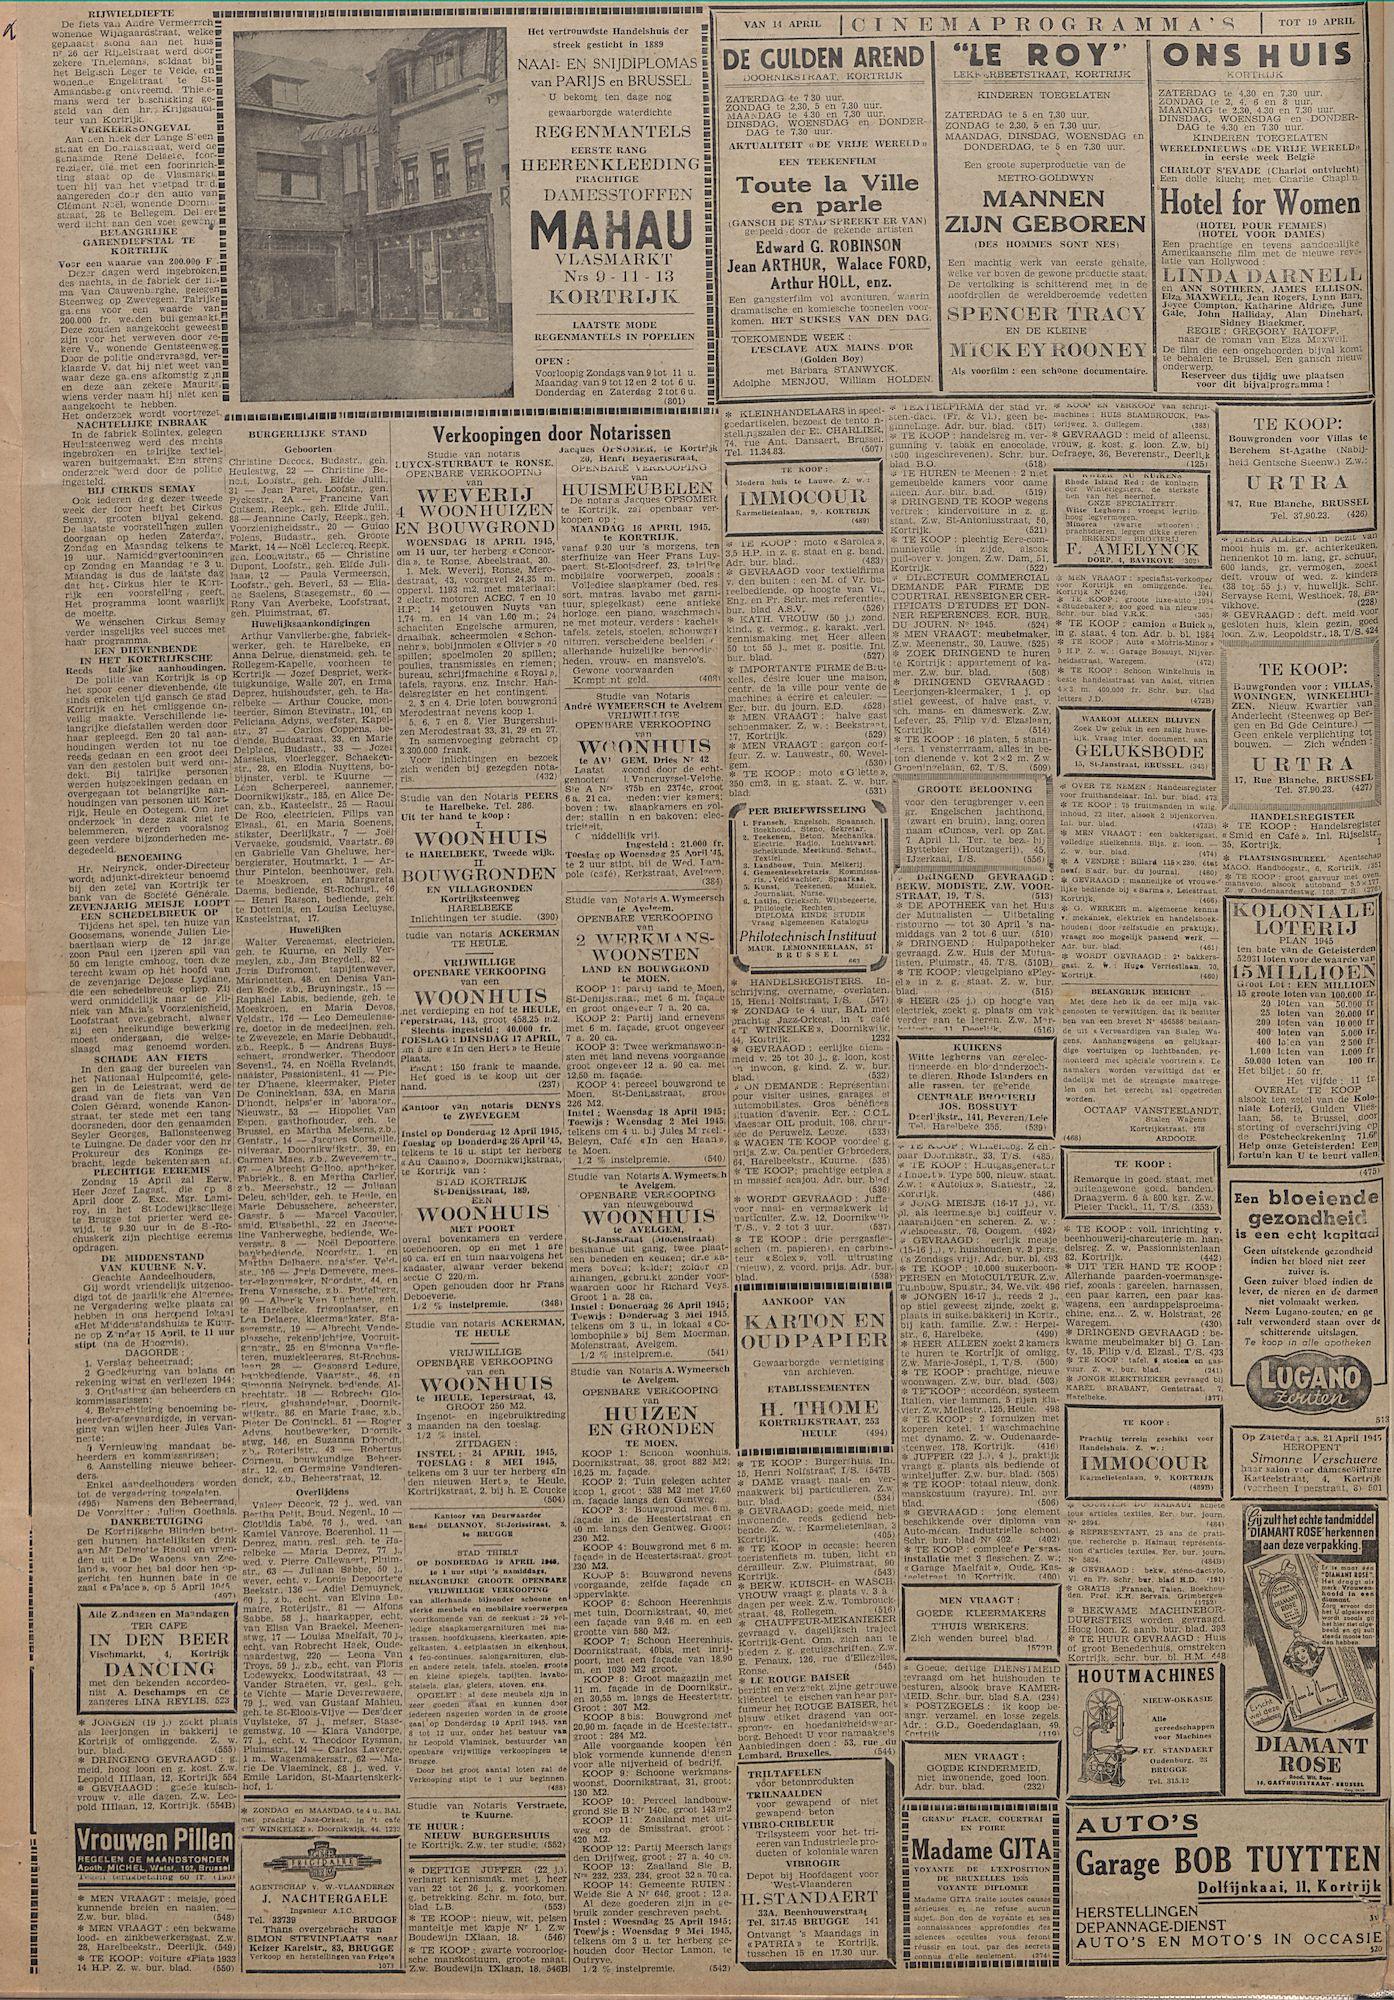 Kortrijksch Handelsblad 14 april 1945 Nr30 p2